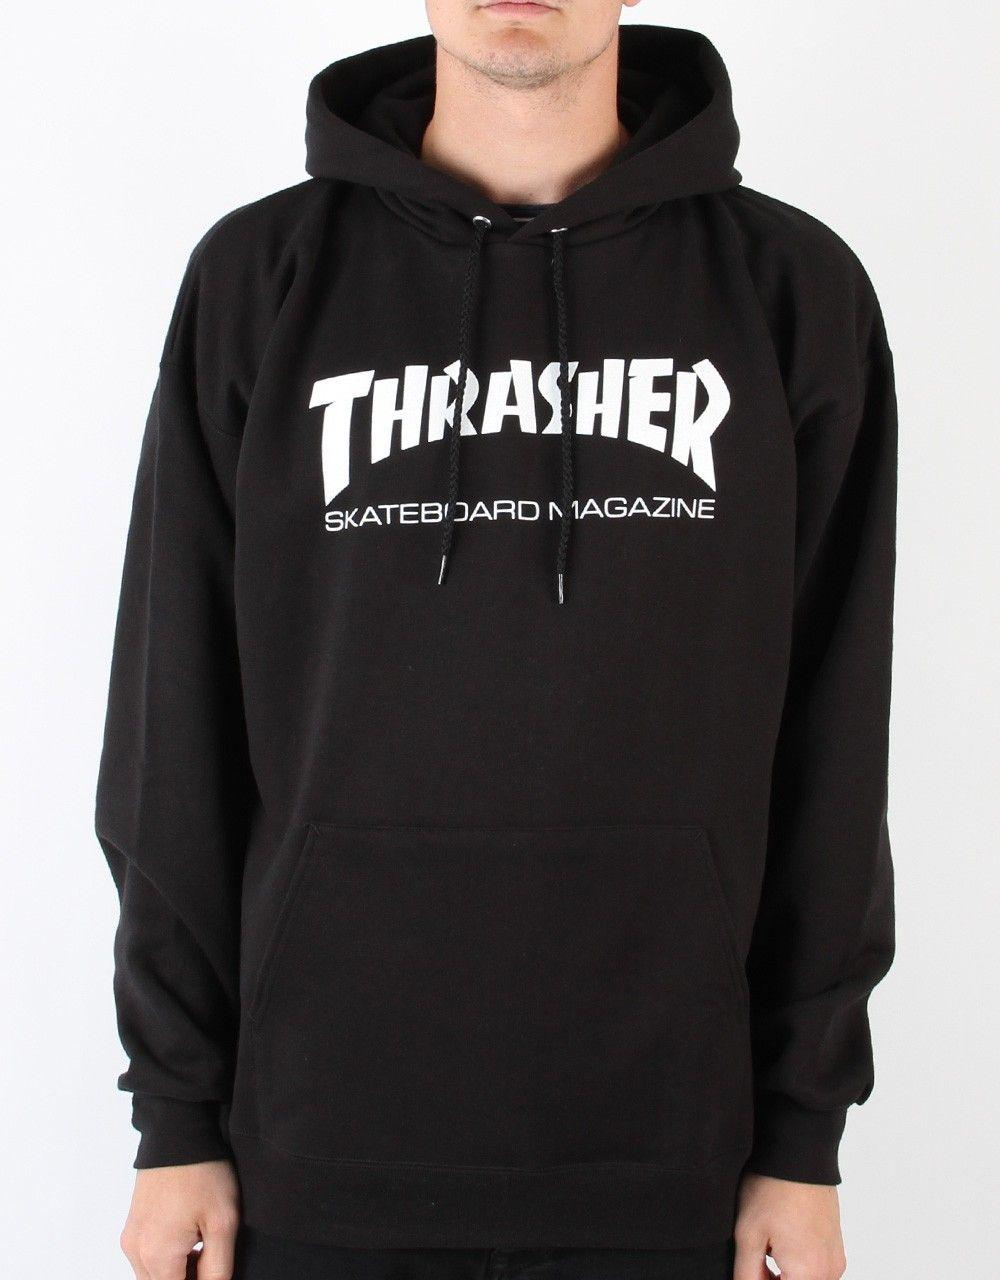 Thrasher Skate Mag Pullover Hood Black Sweat Hoodie Thrasher Skate Thrasher [ 1280 x 1000 Pixel ]